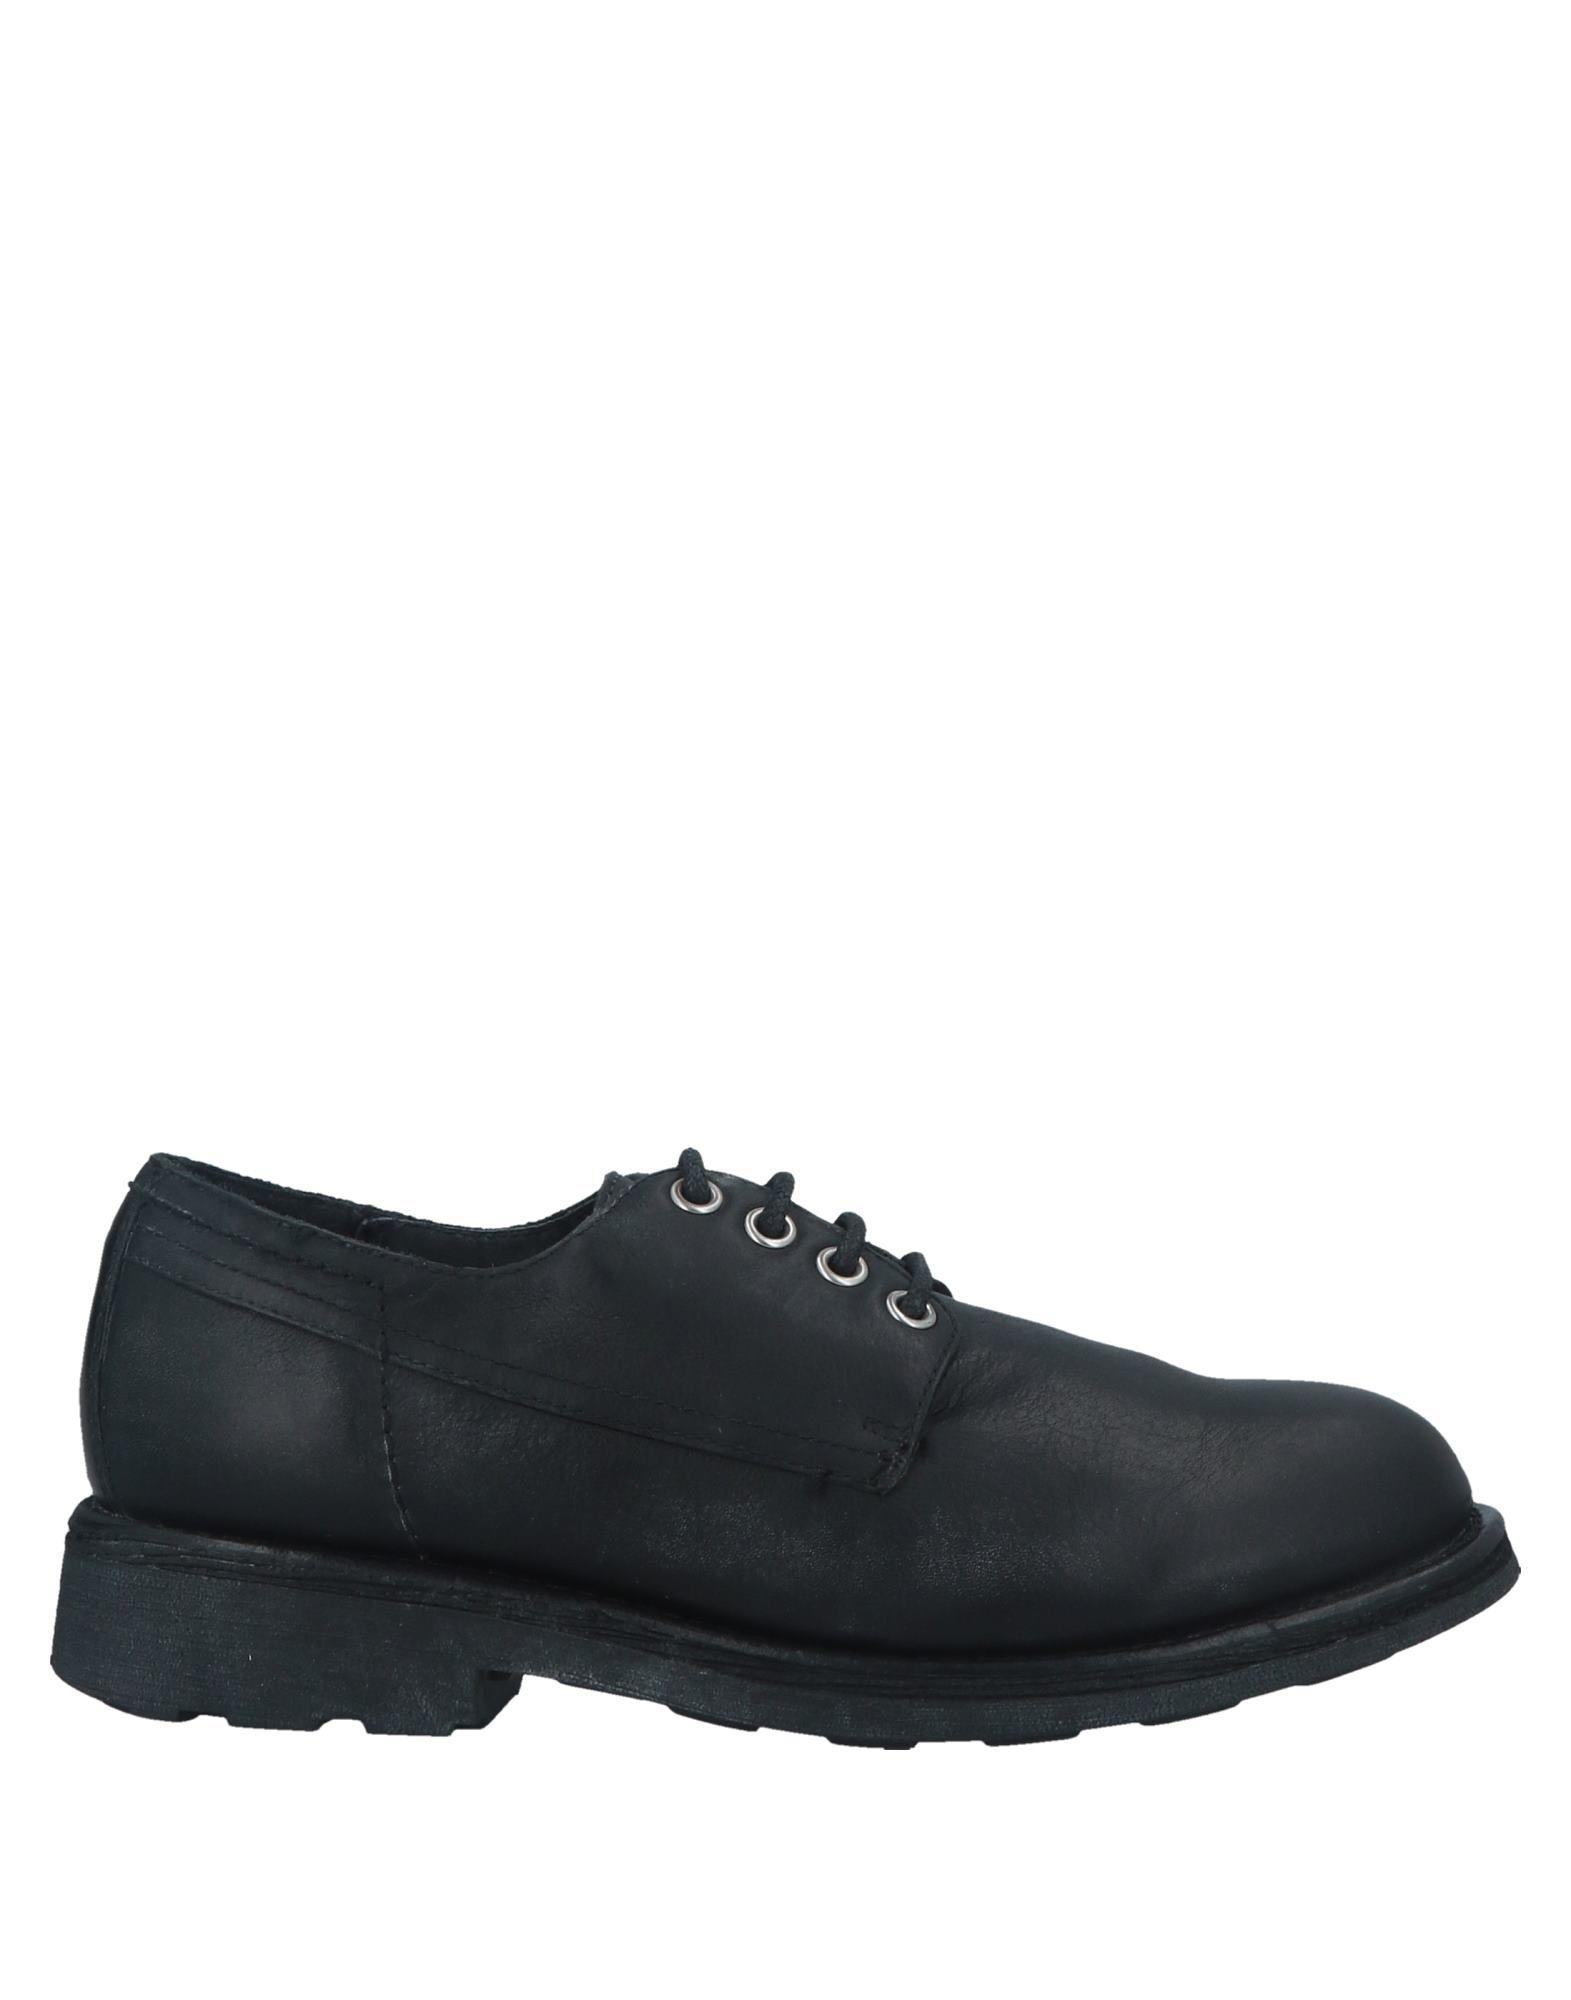 все цены на BIKKEMBERGS Обувь на шнурках онлайн